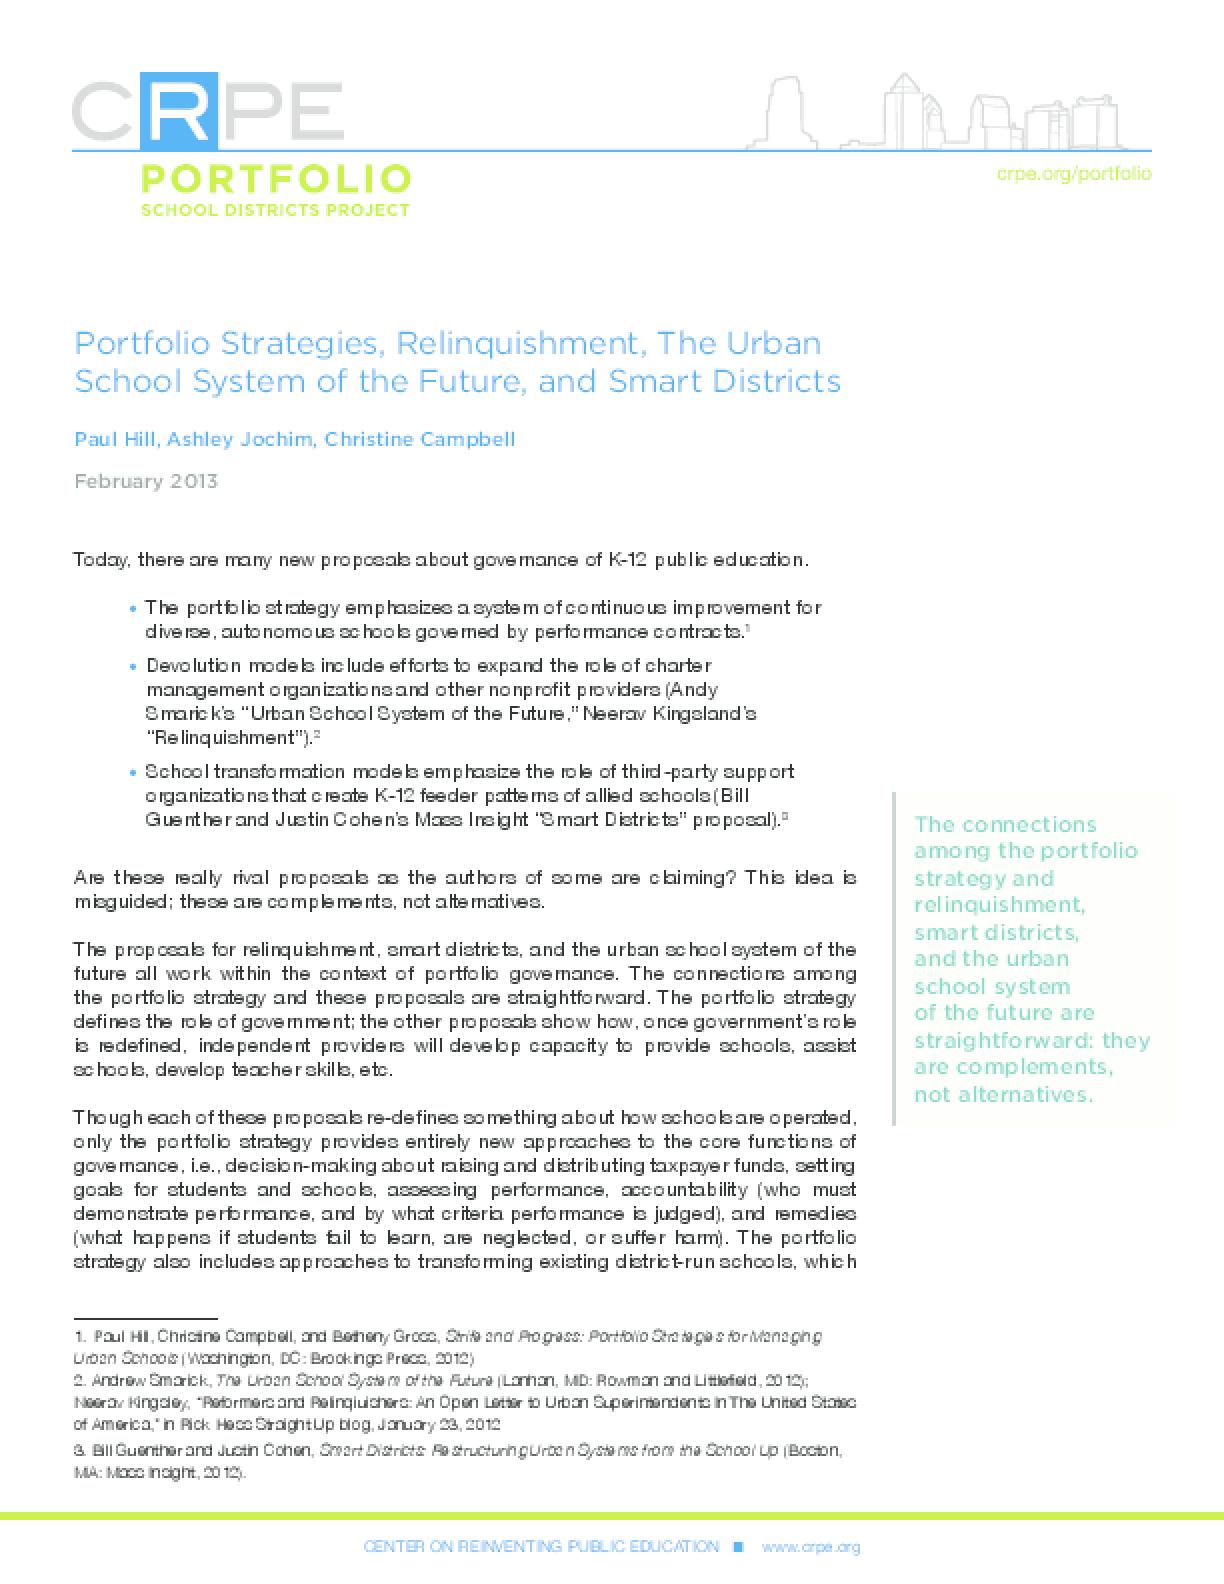 Portfolio Strategies, Relinquishment, The Urban School System of the Future, and Smart Districts